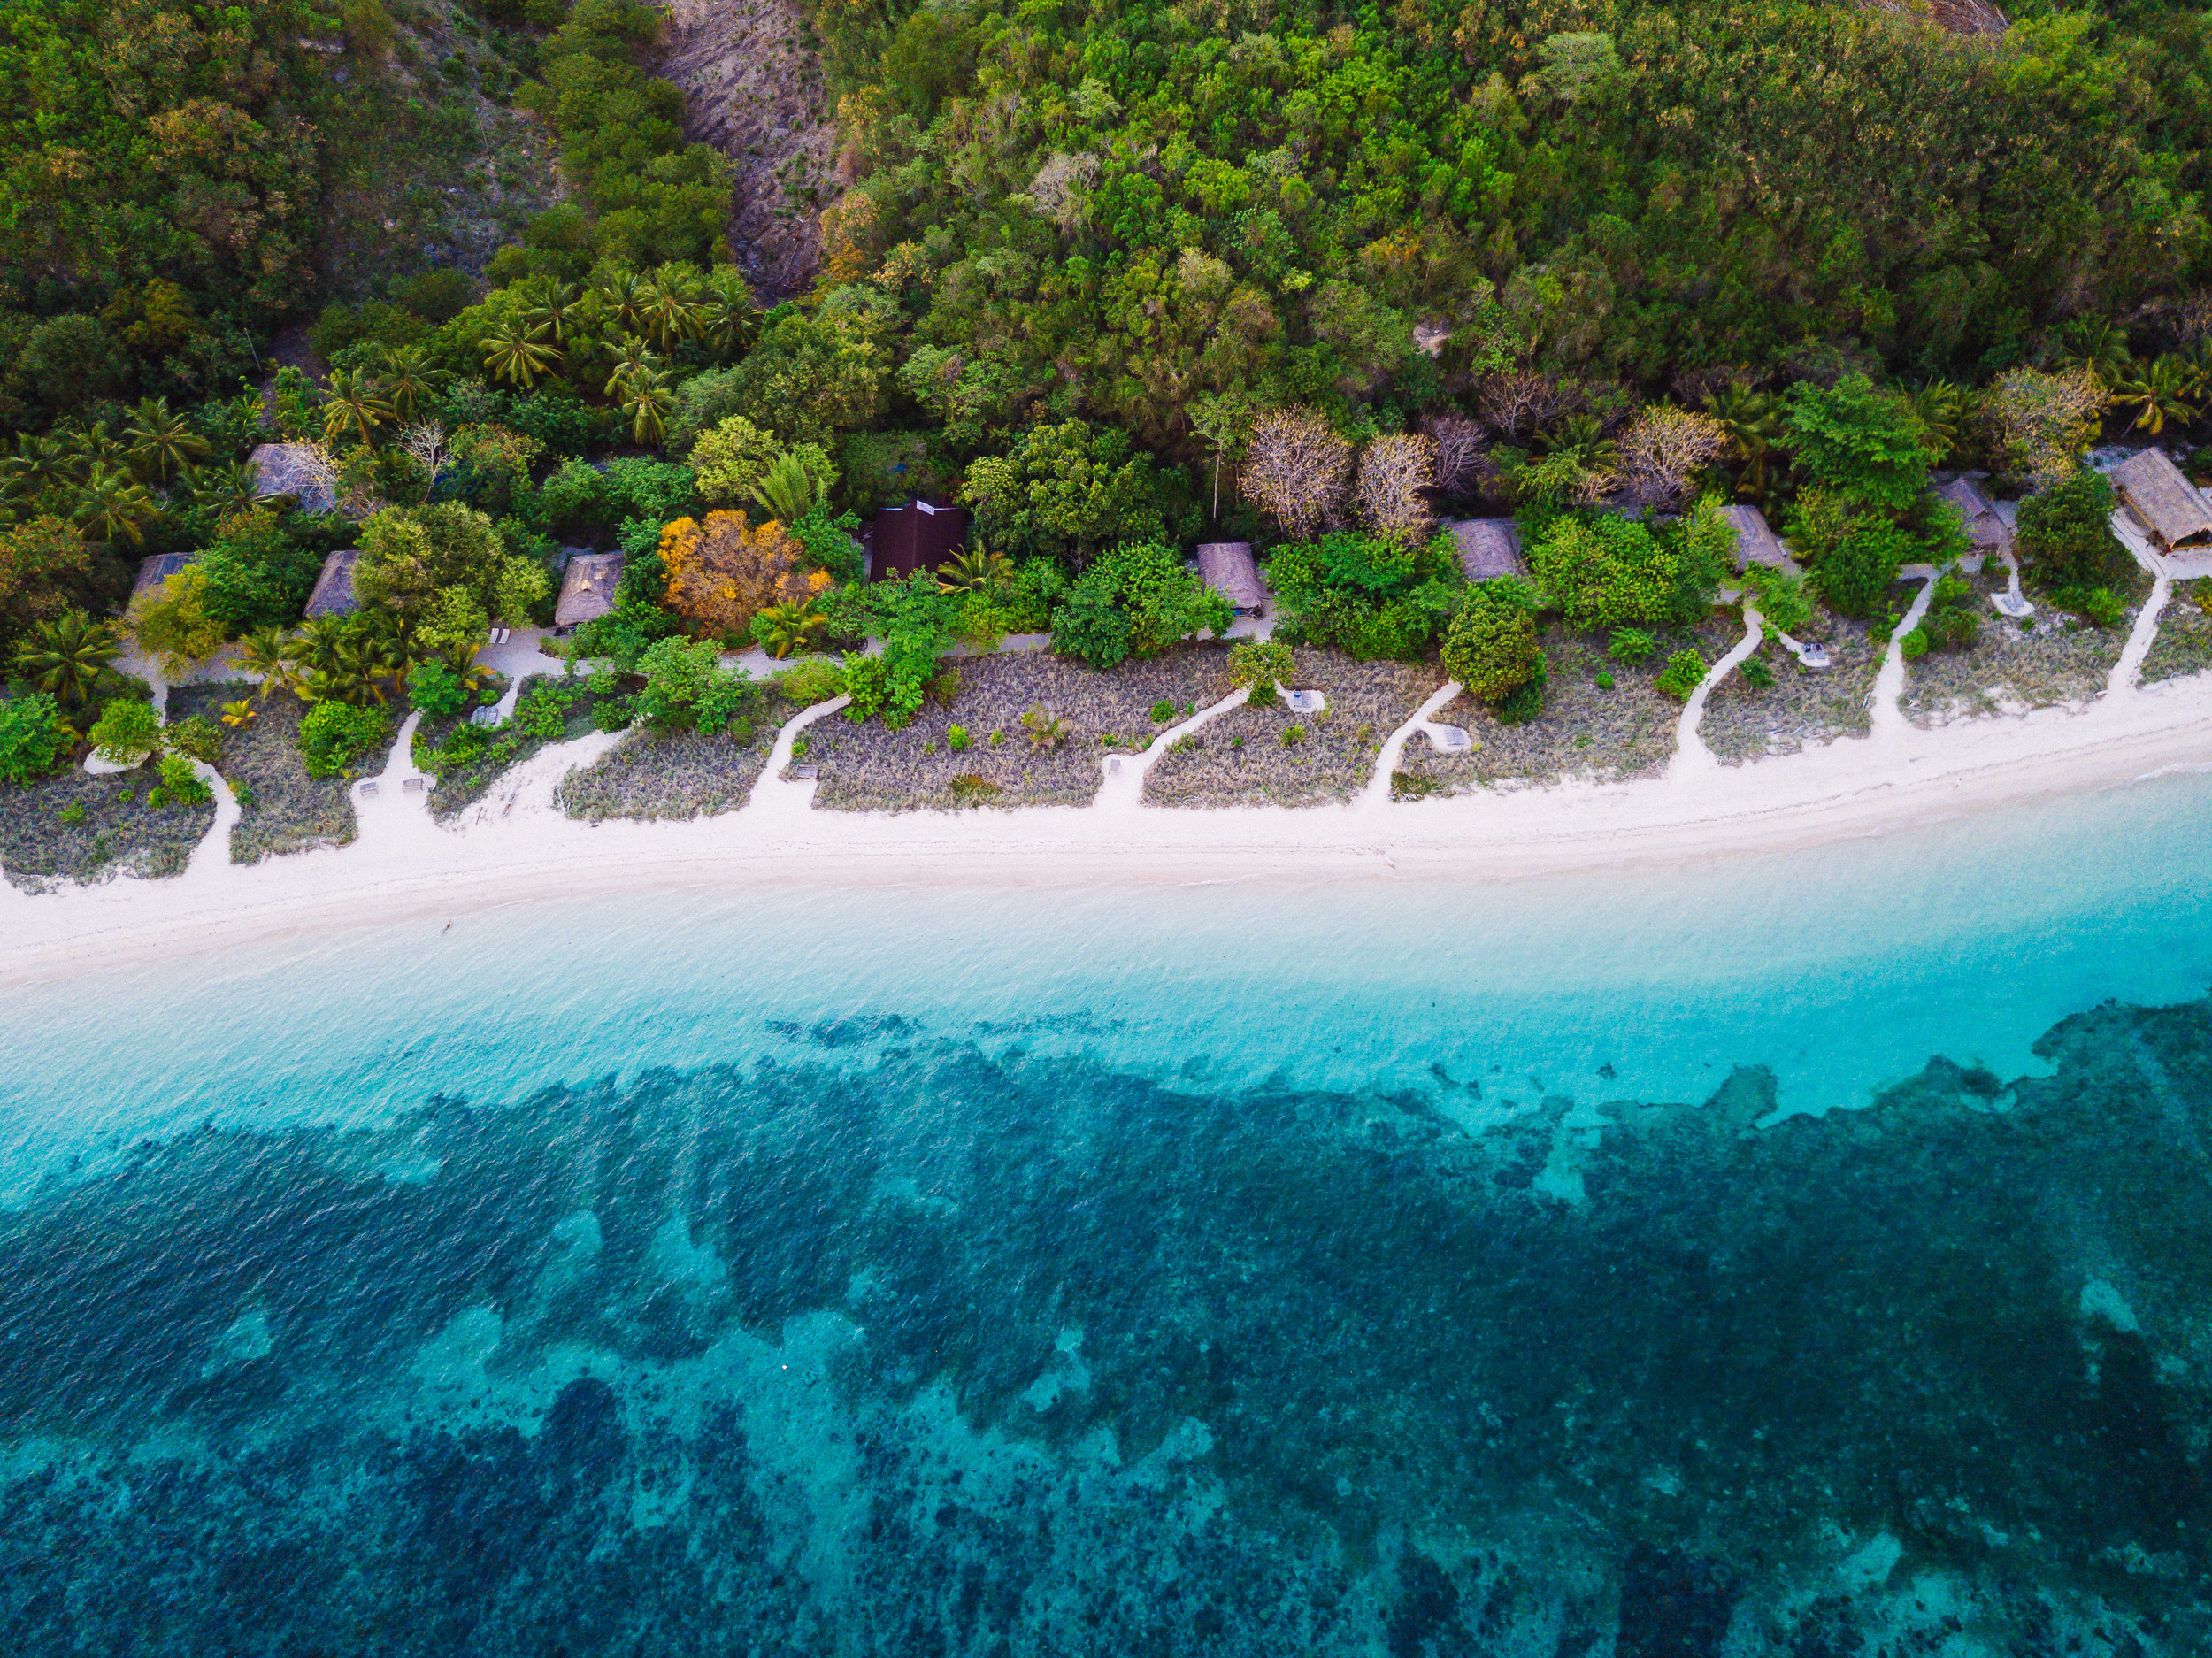 ALOR, INDONESIA CREDIT: ERIK LUKAS / coral reef image bank